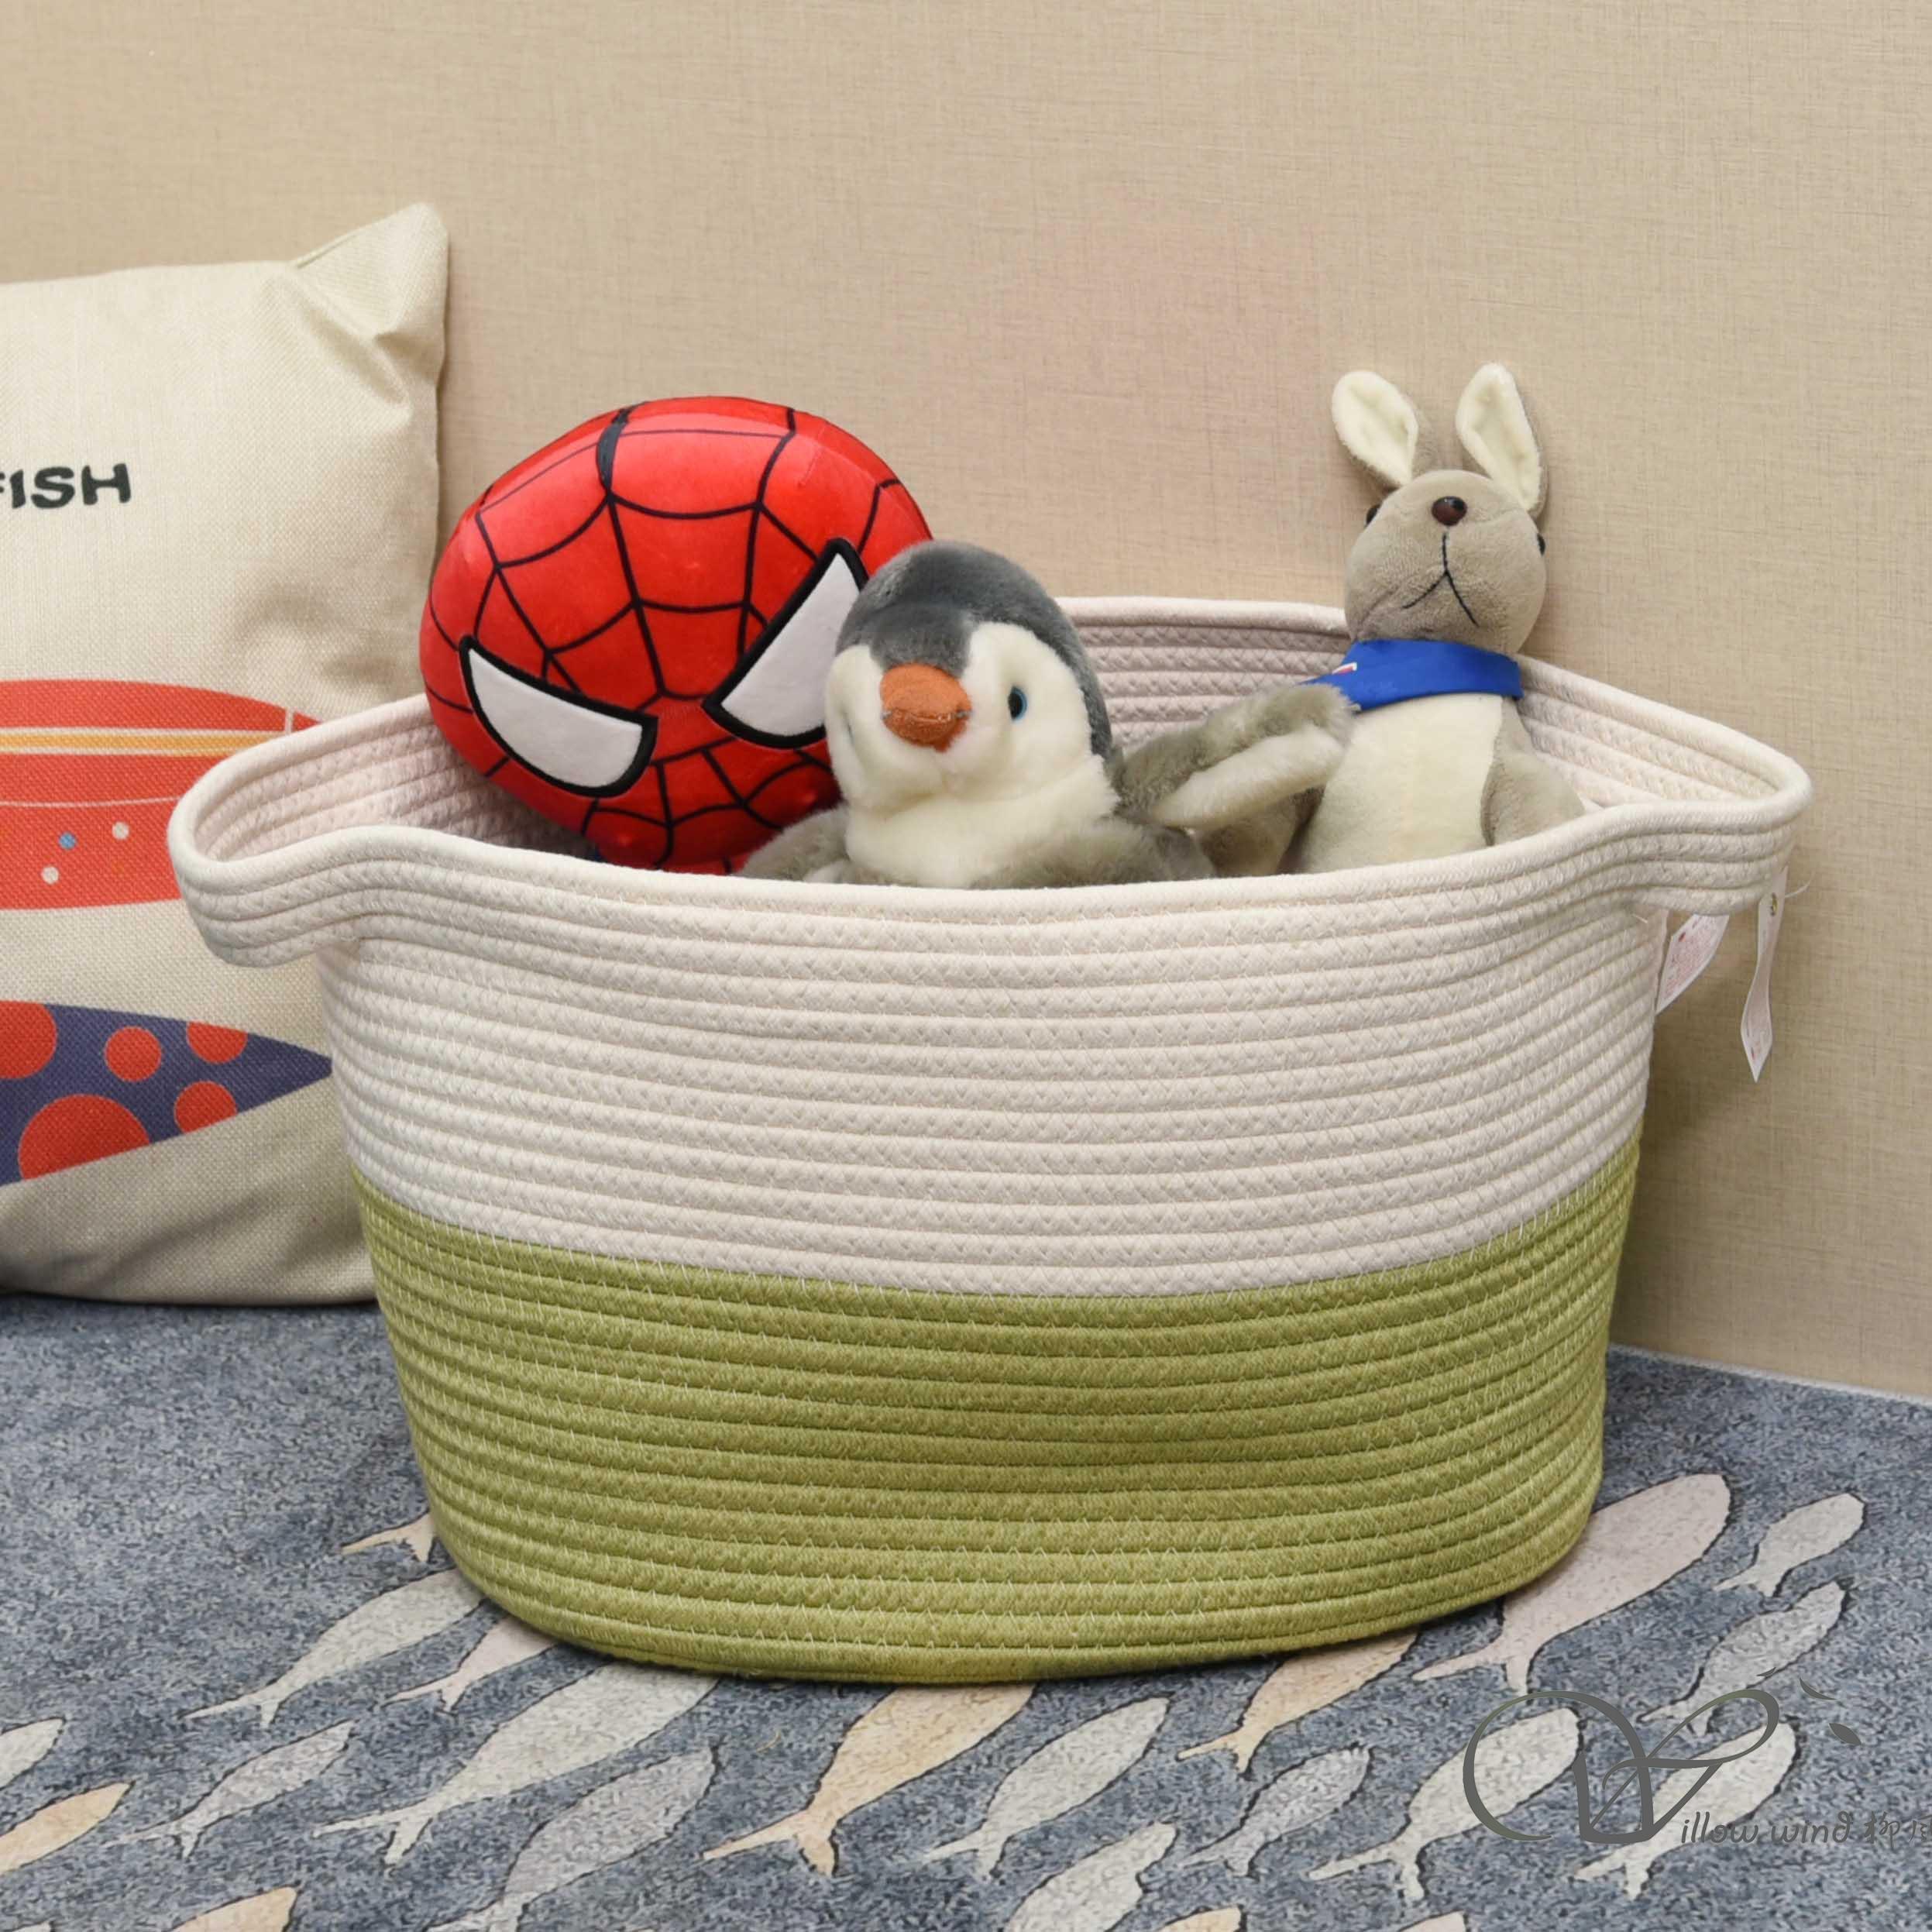 Off-white+green cotton rope storage basket bin box